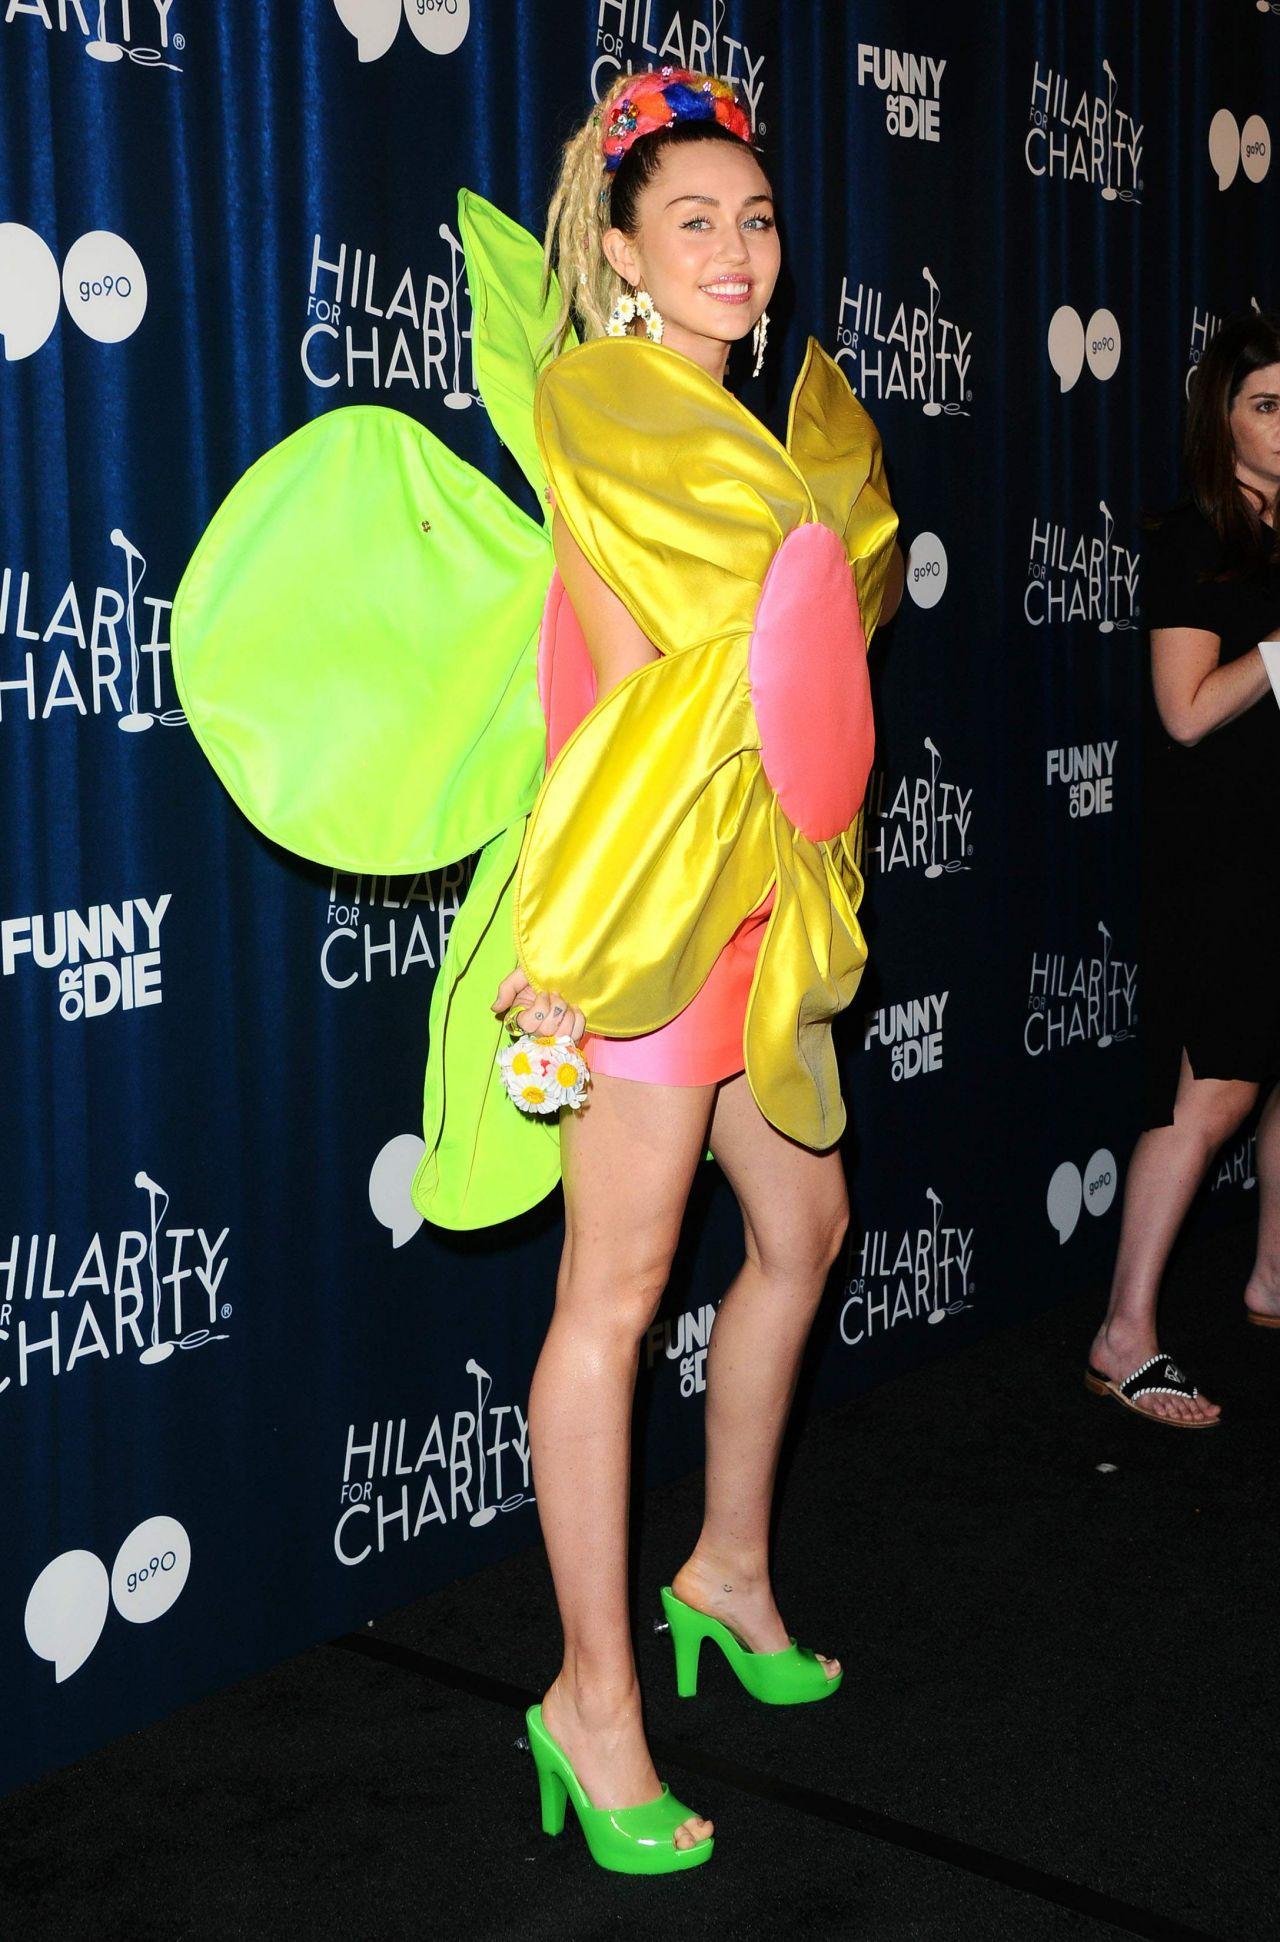 Miley cyrus kdwb jingle ball 2013 - 1 part 9